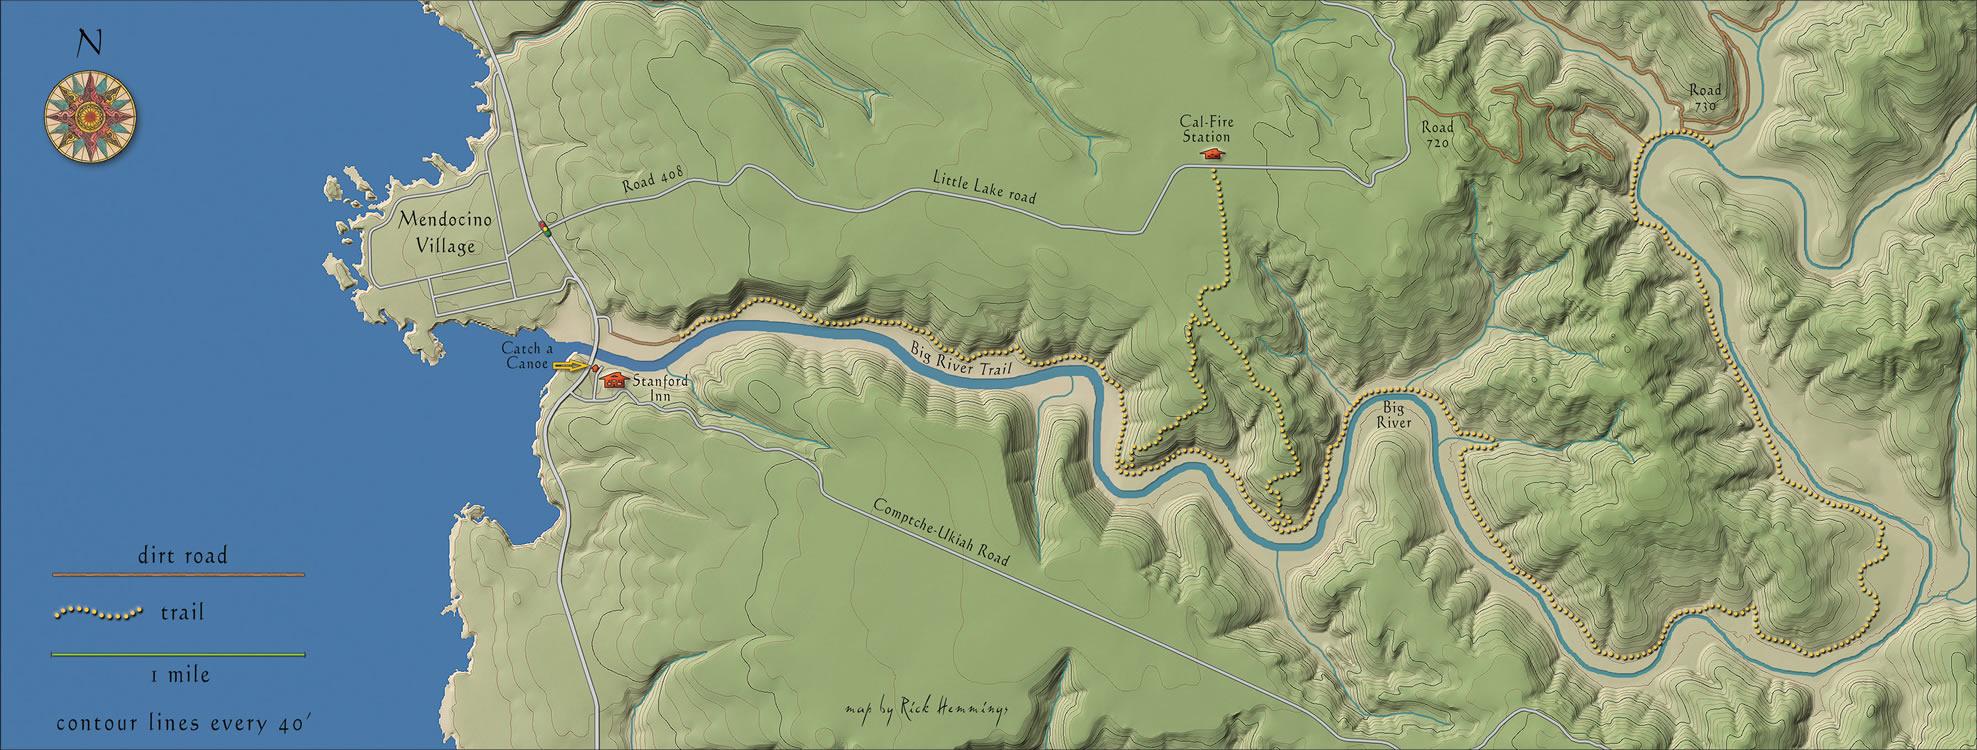 big river mendocino terrain map